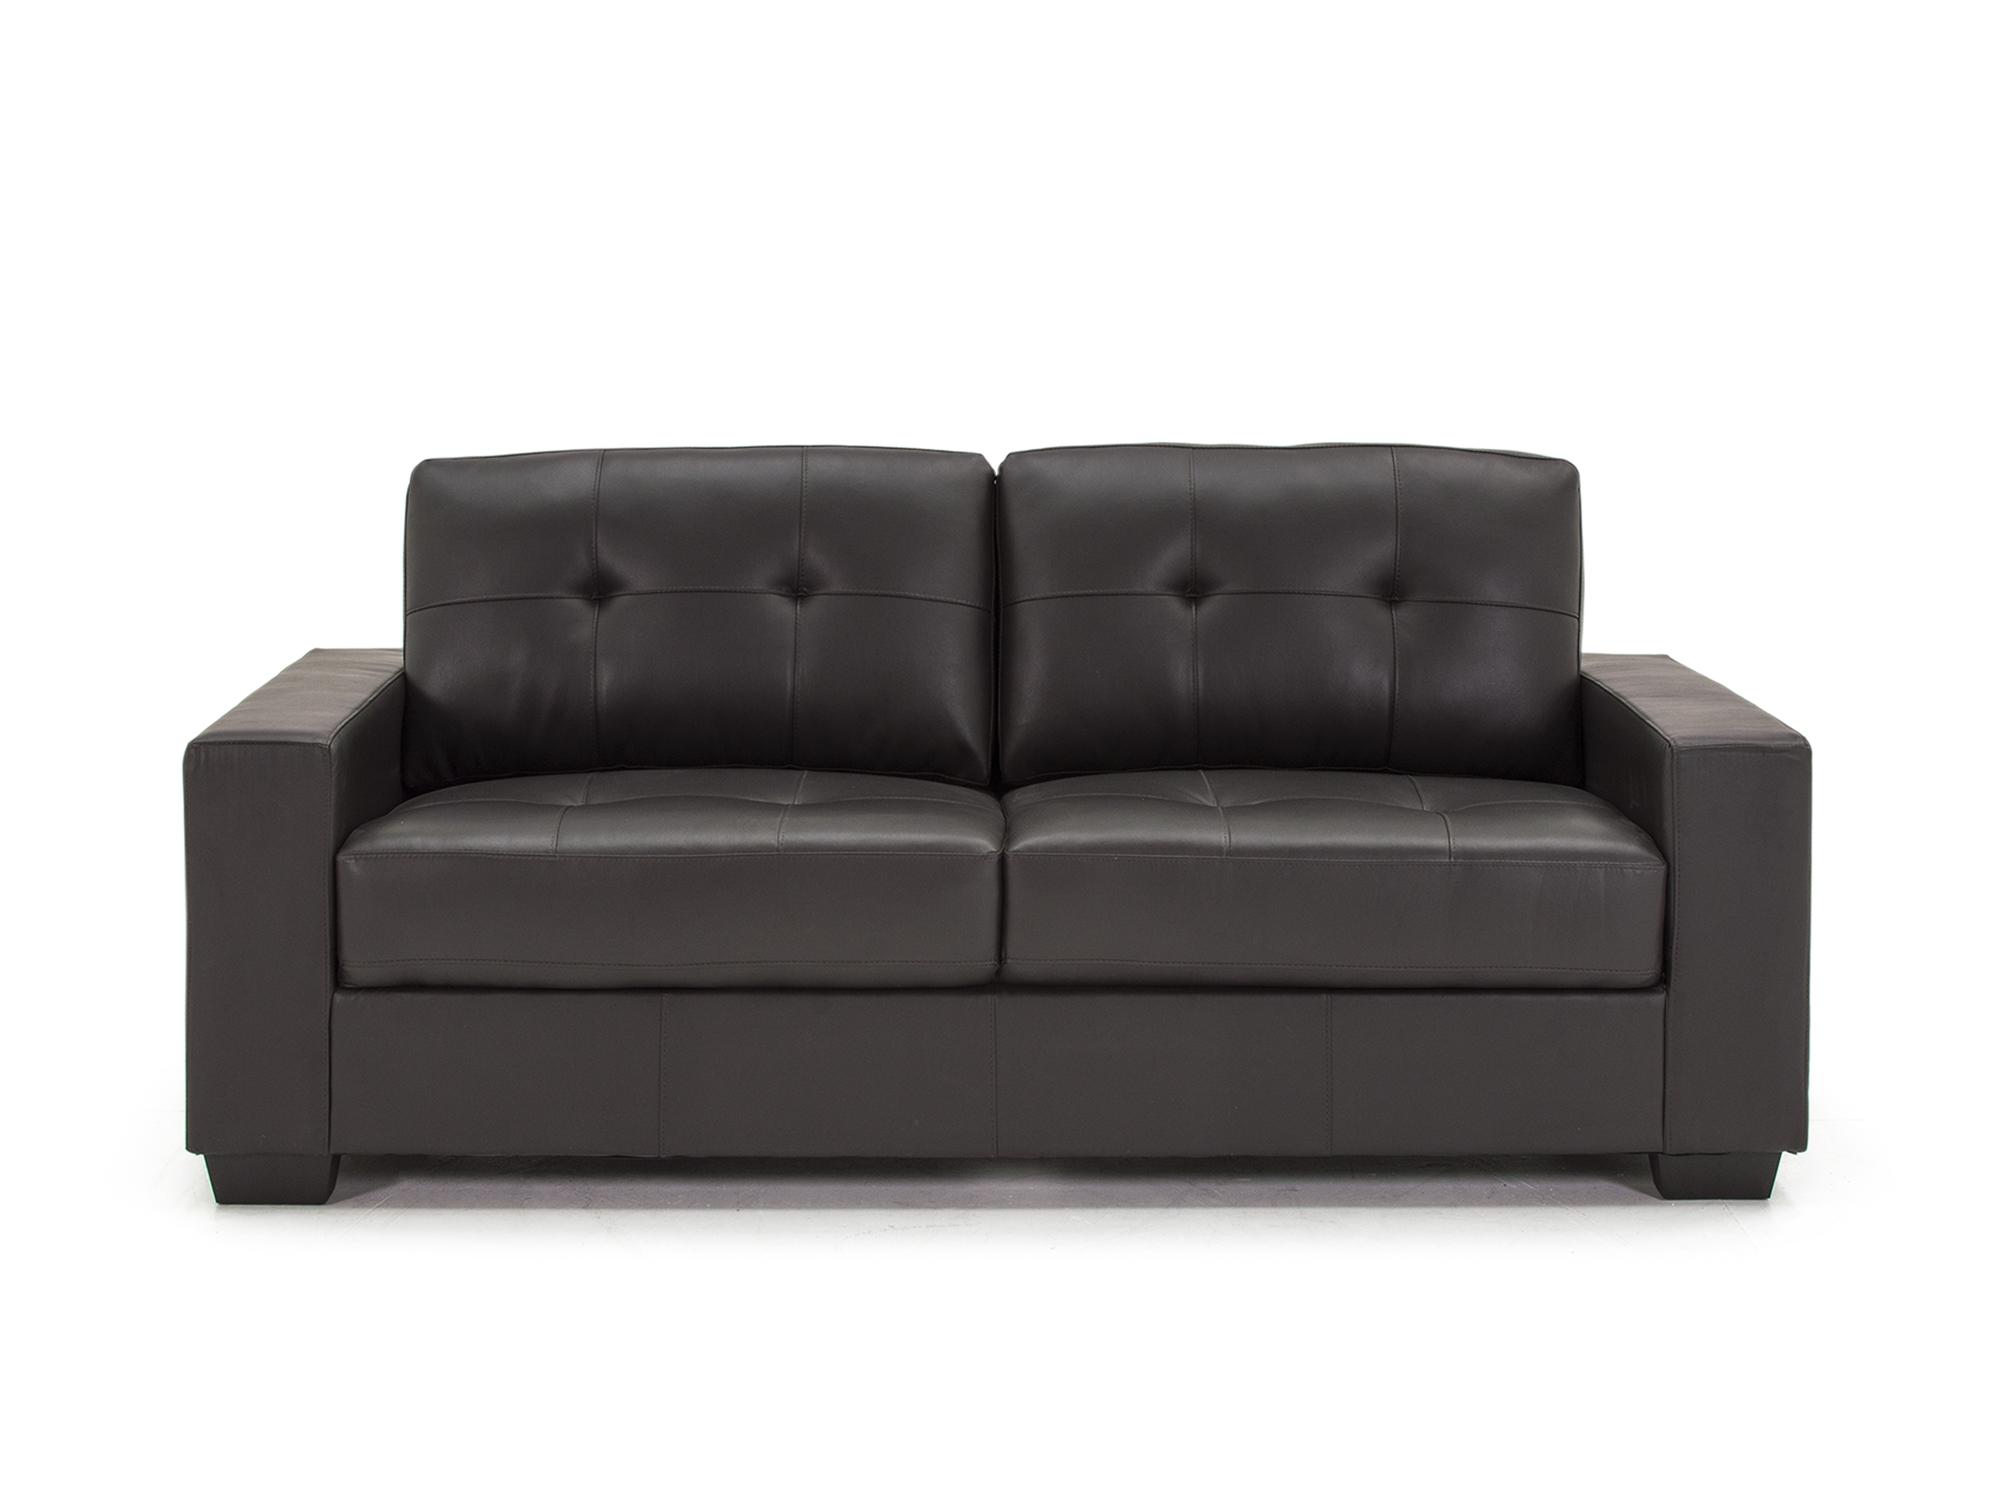 Canapea fixa 3 locuri Gemona Brown